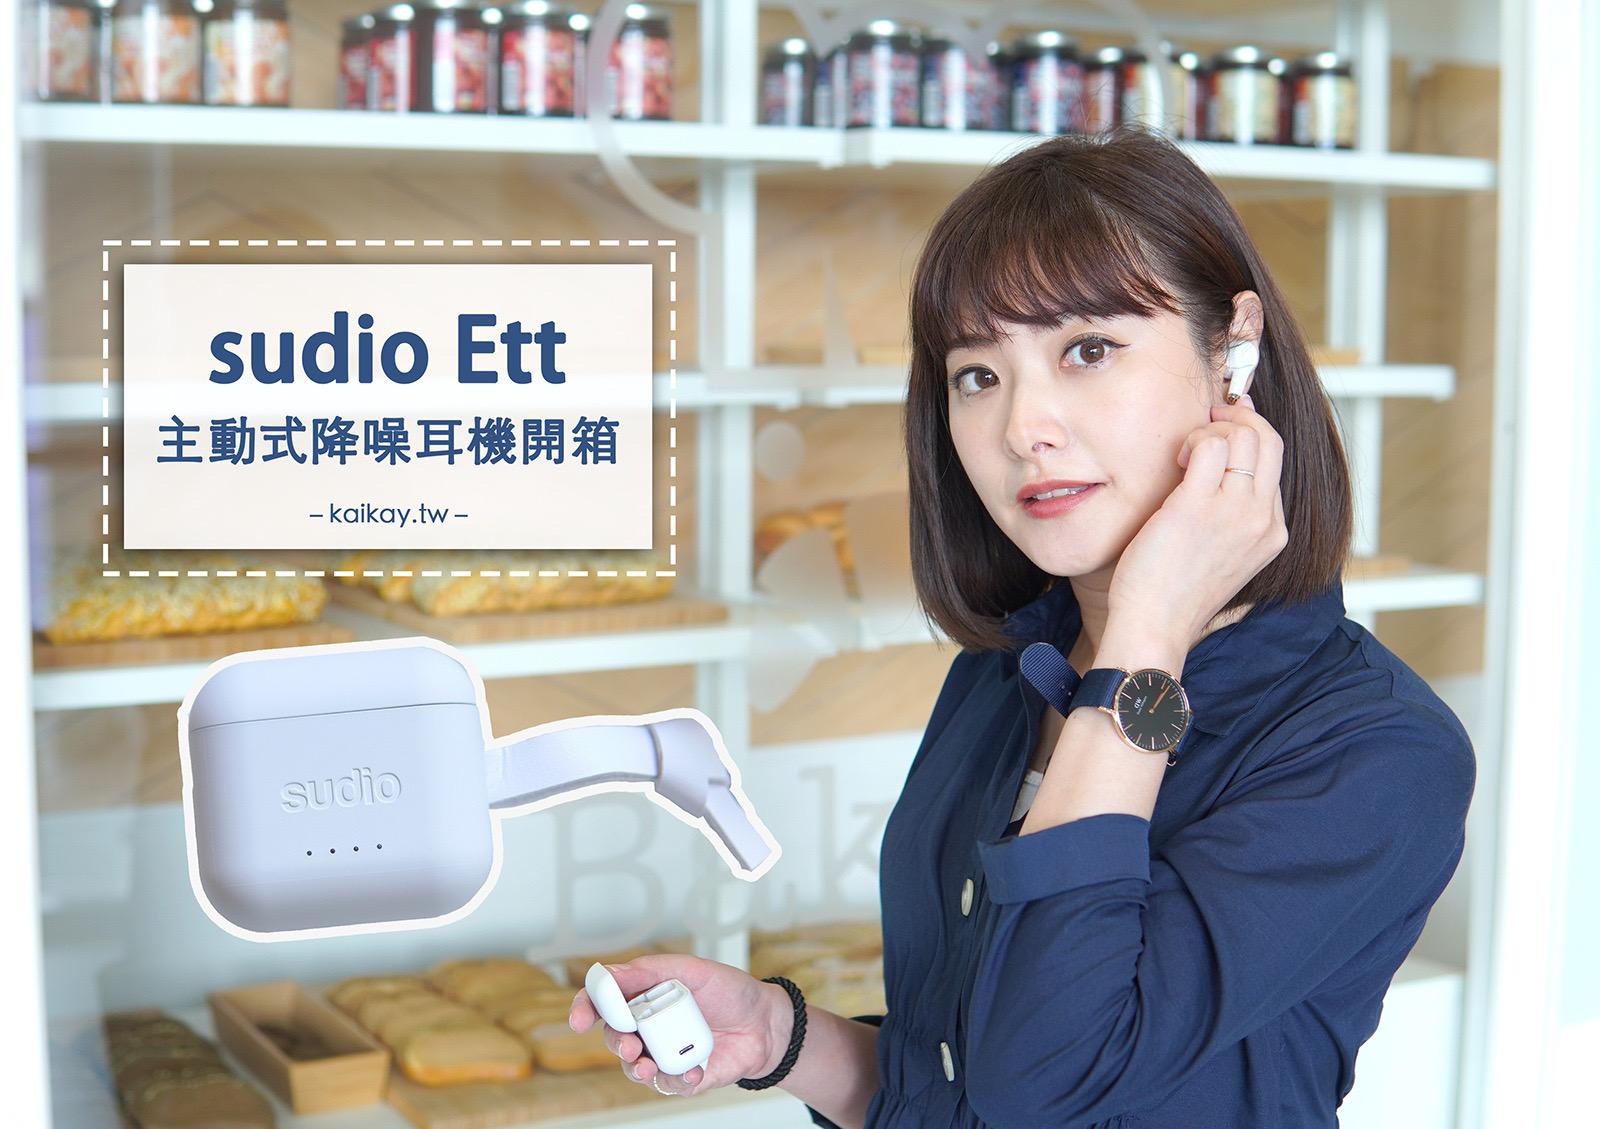 ☆【3C】瑞典 sudio Ett 主動式降噪藍牙耳機。一戴上就鑽進自己的小世界裡 @凱的日本食尚日記